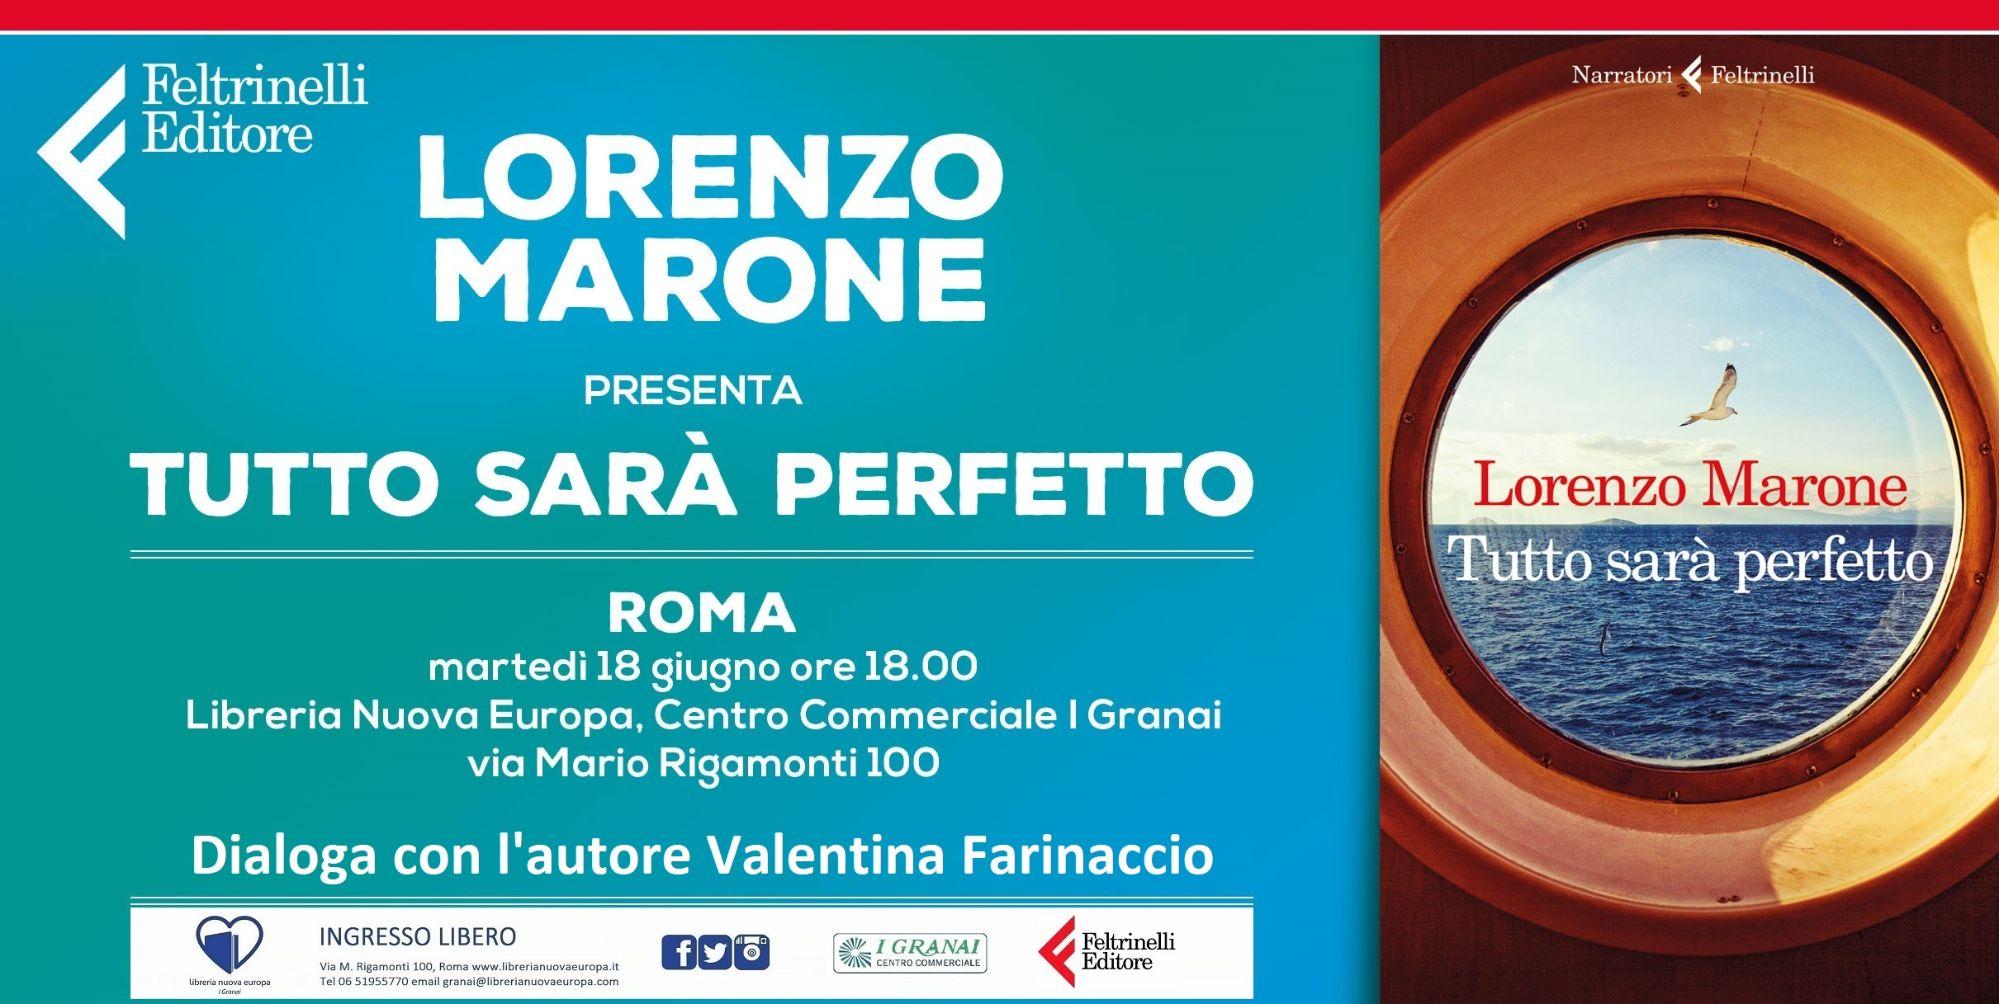 Lorenzo Marone presenta